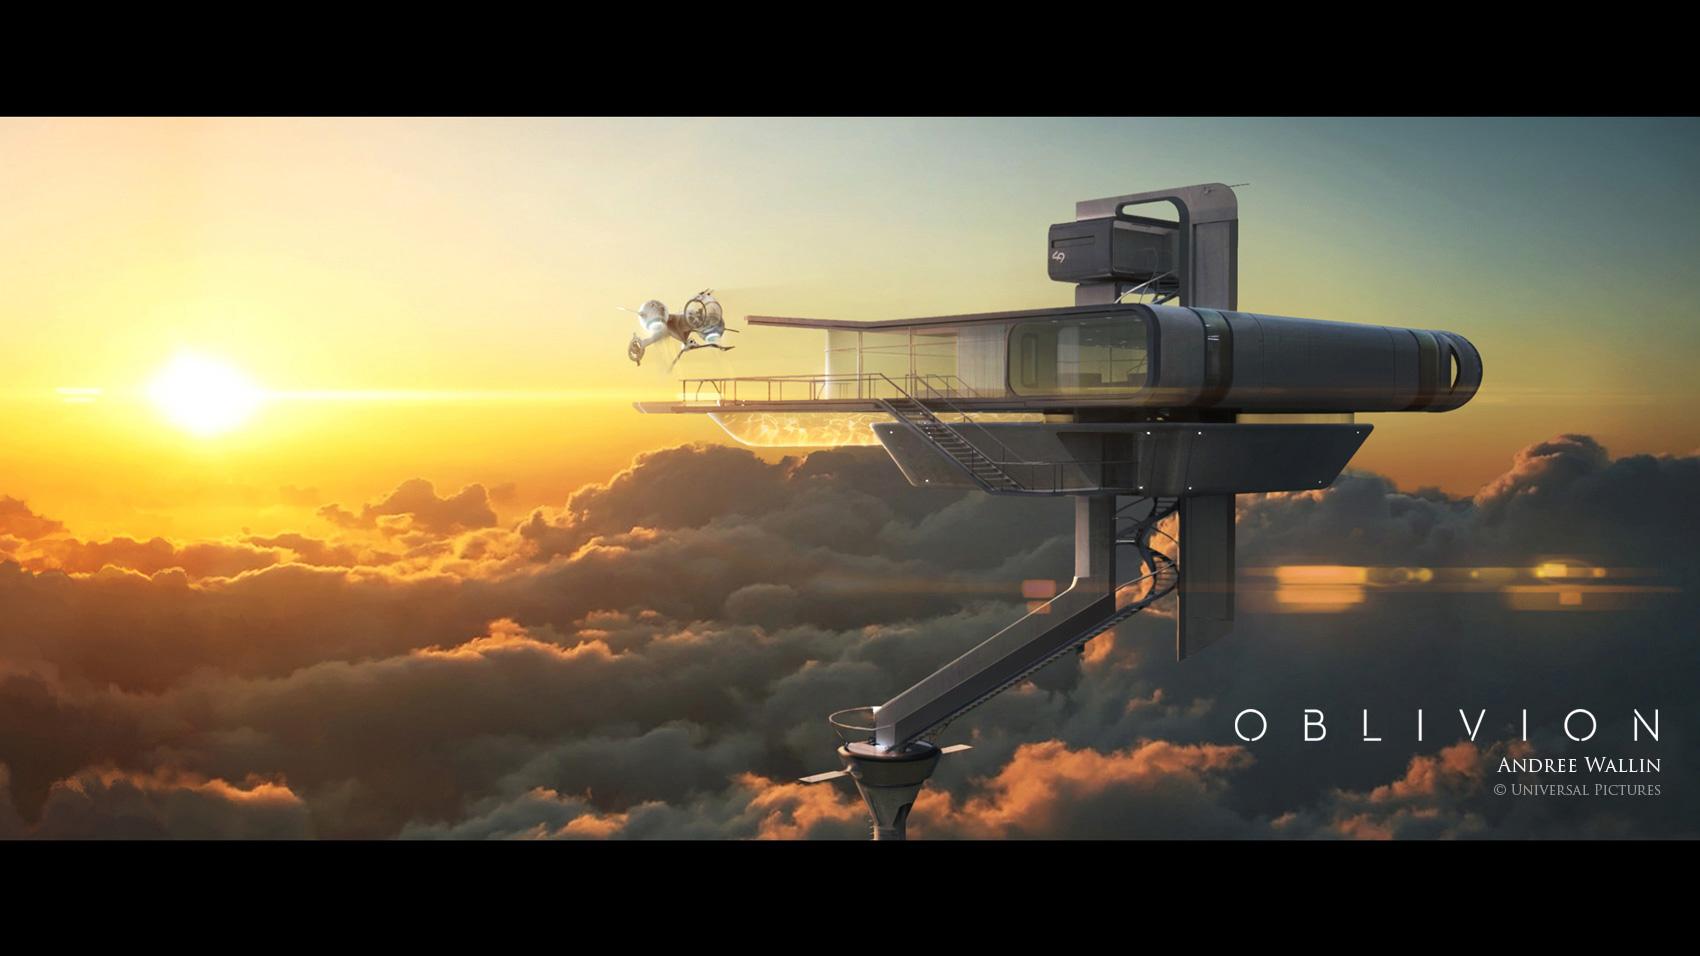 Oblivion Concept Illustrations by Andrée Wallin | Concept Art World